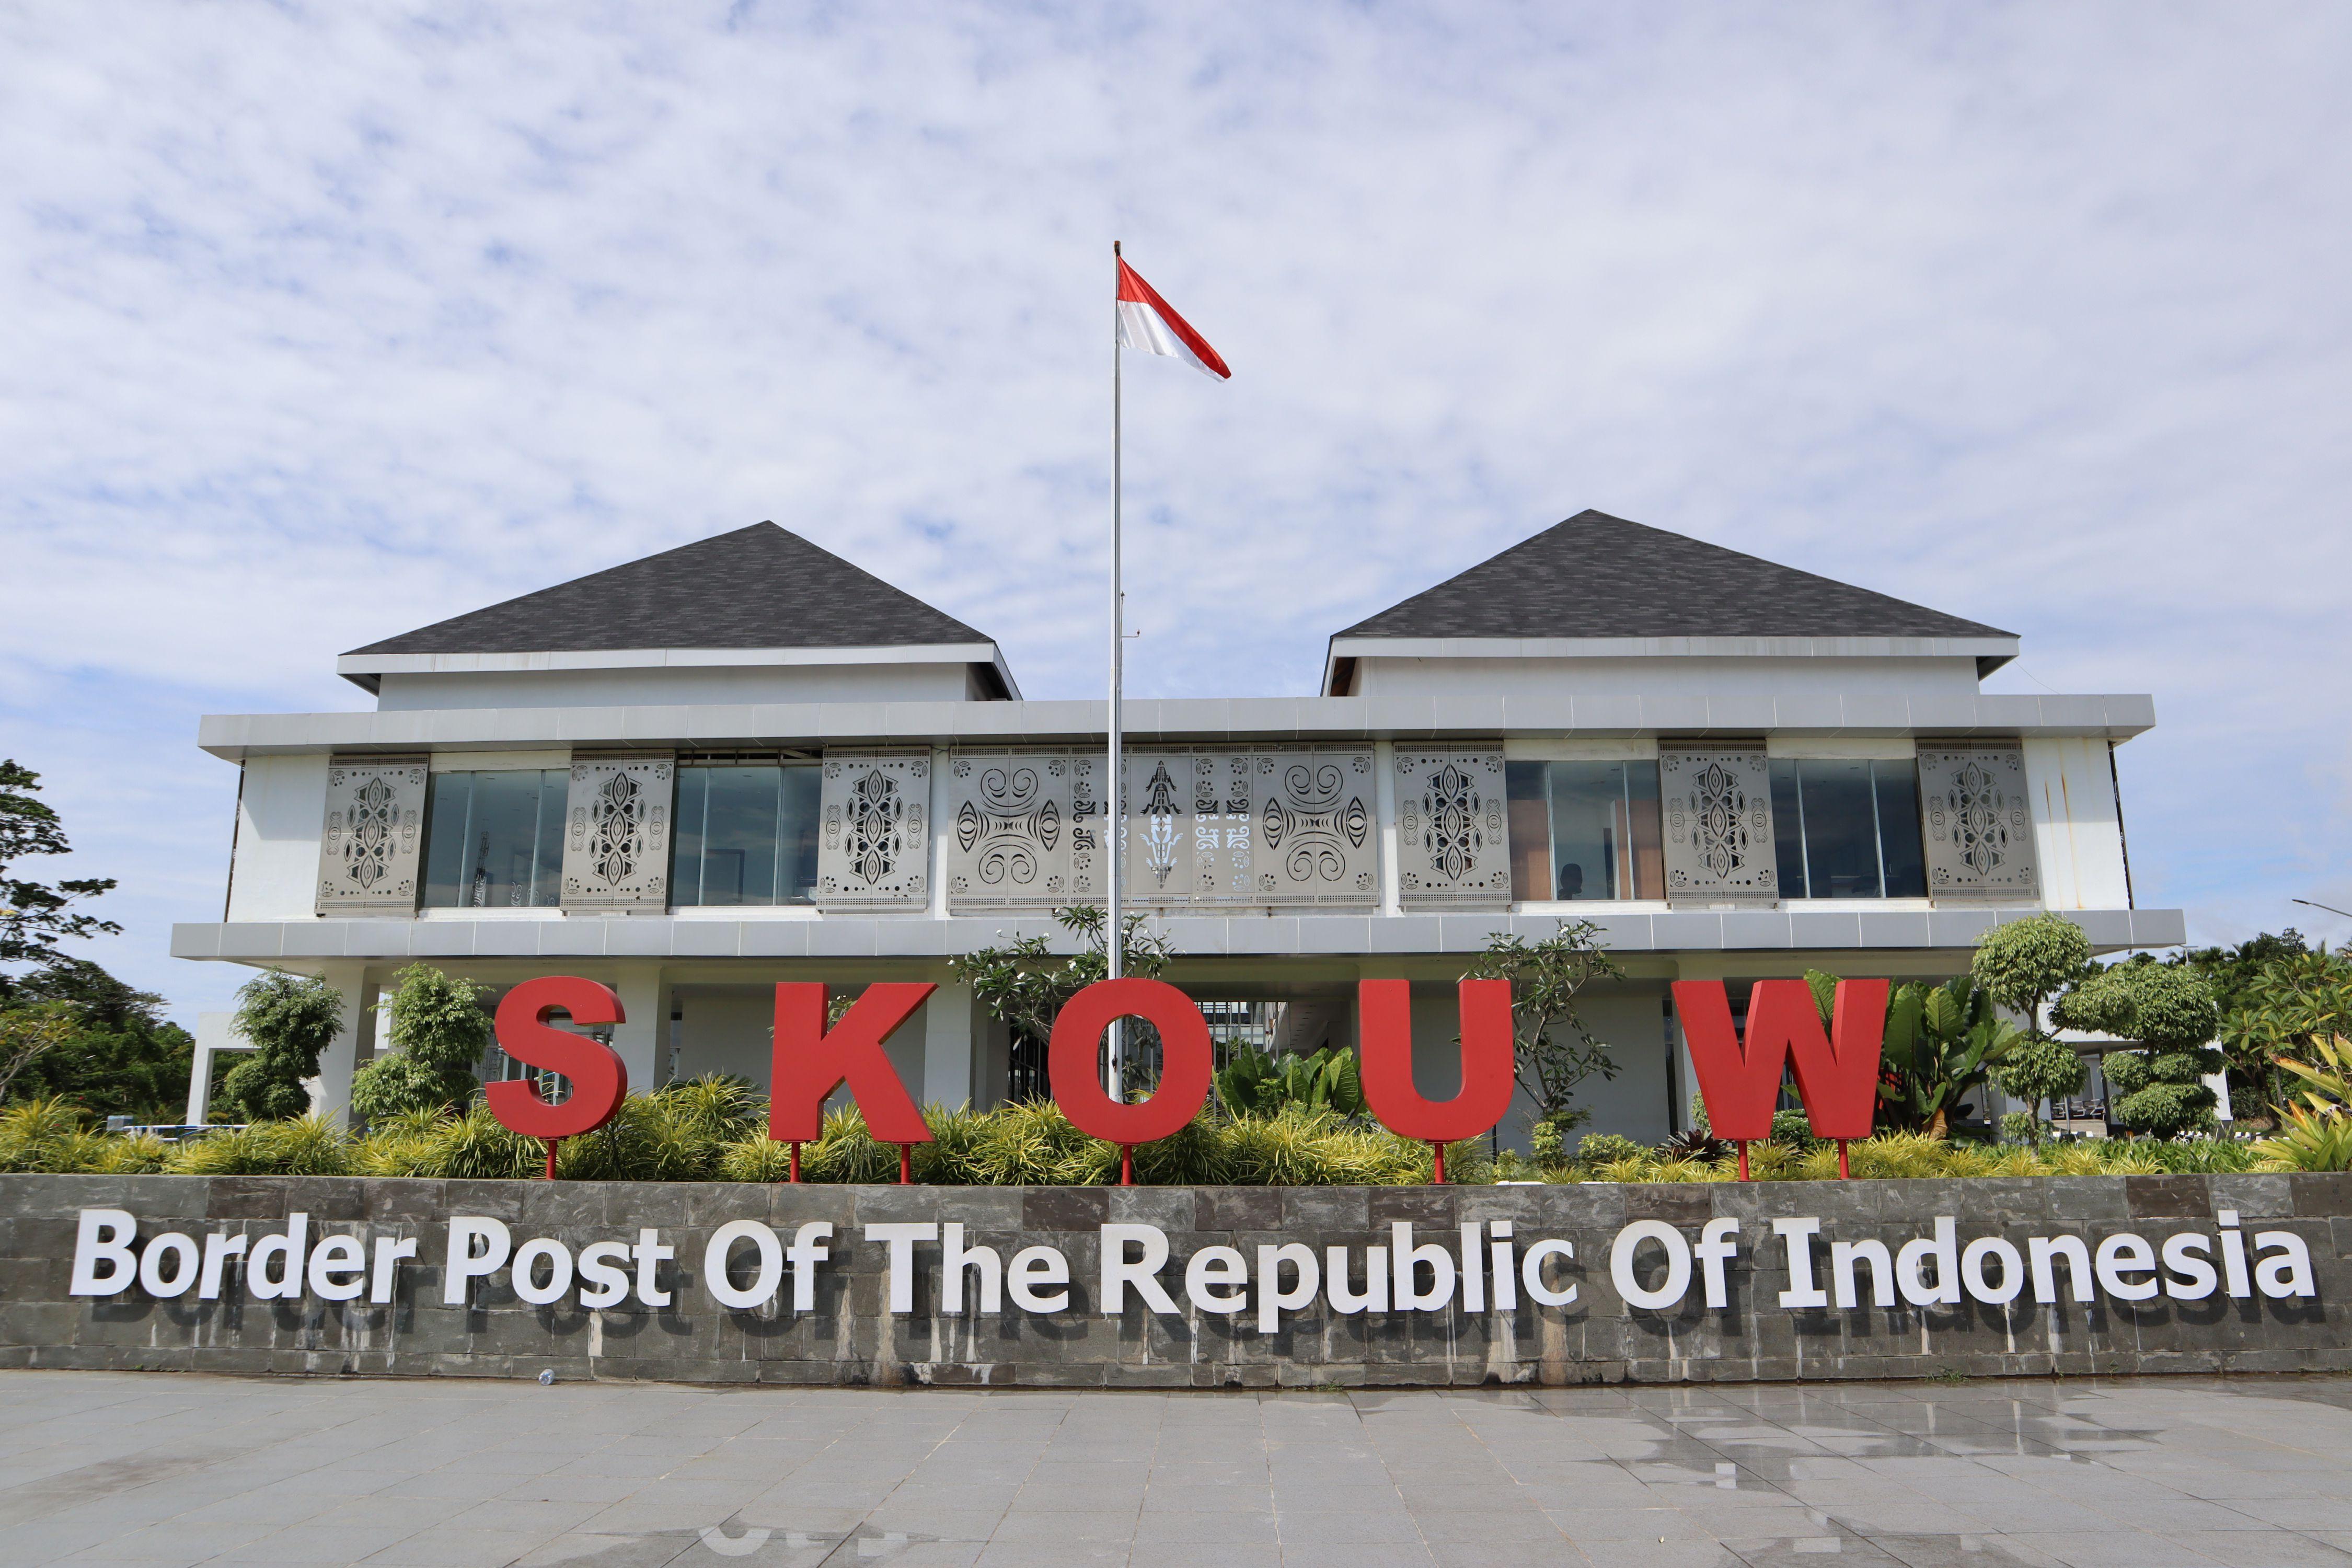 Jaga Aset Negara: Pos Lintas Batas Negara (PLBN) Skouw, Gerbang Paling Timur Indonesia